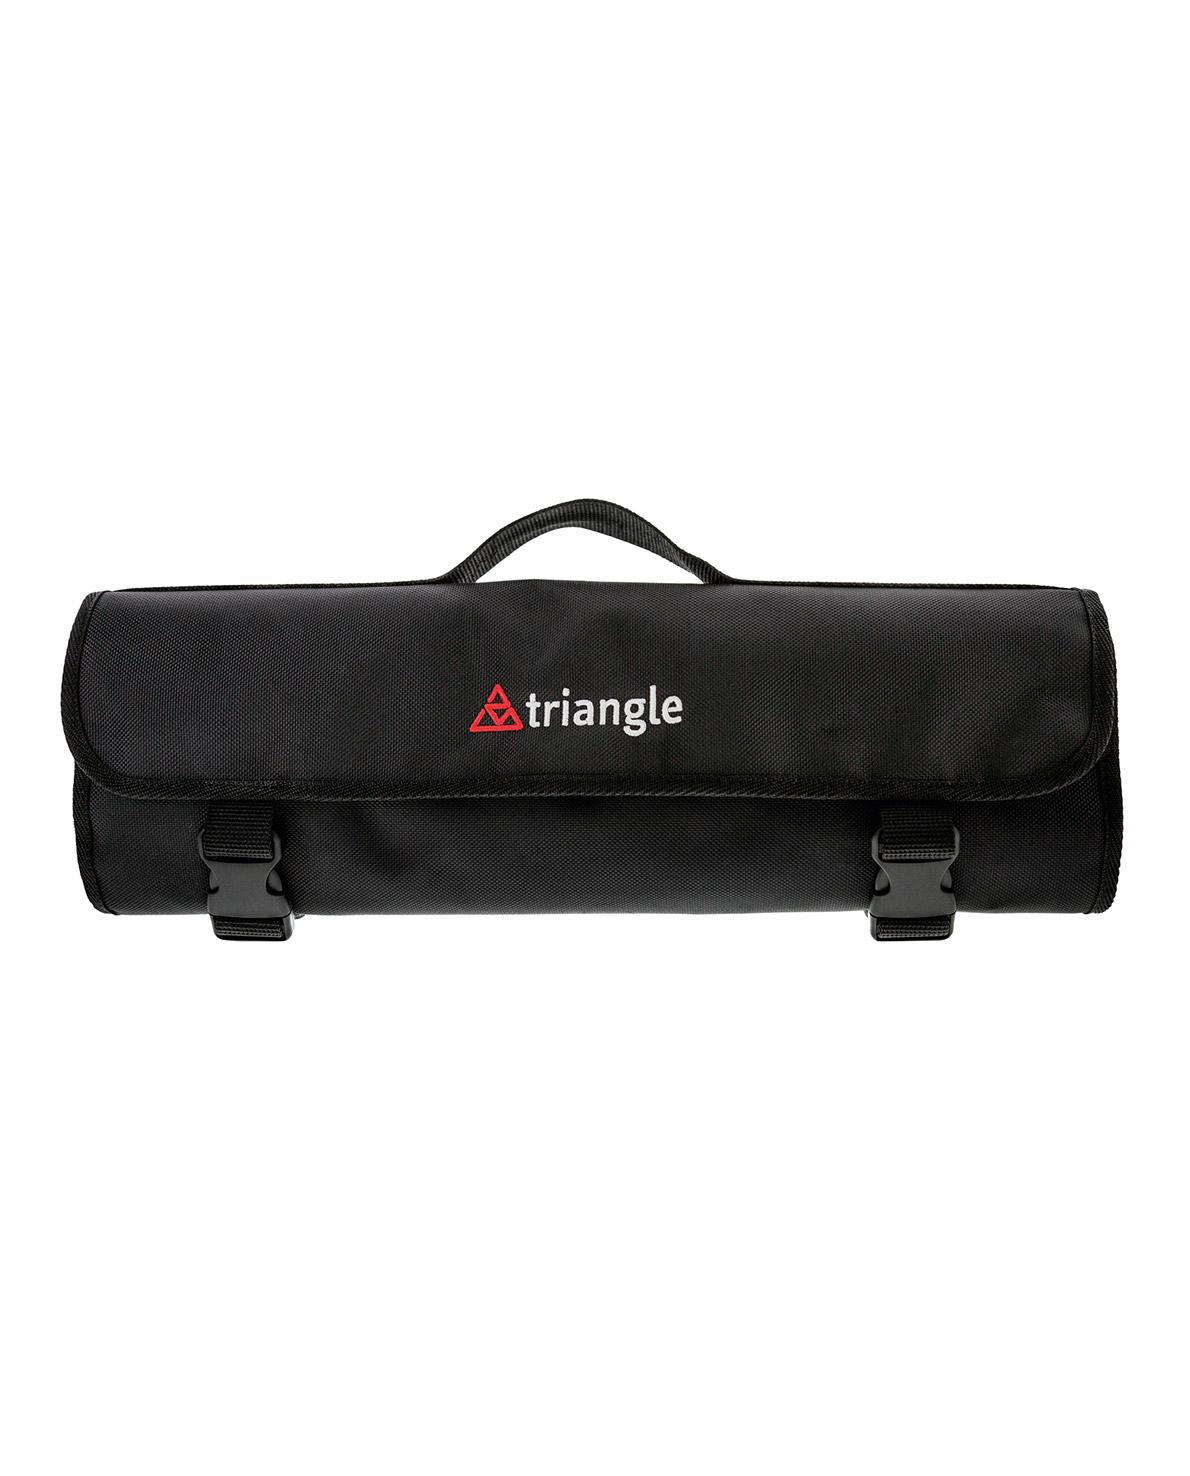 triangle Kochschultasche Messertasche groß viel Platz Rolltasche schwarzgeschlossen gerollt